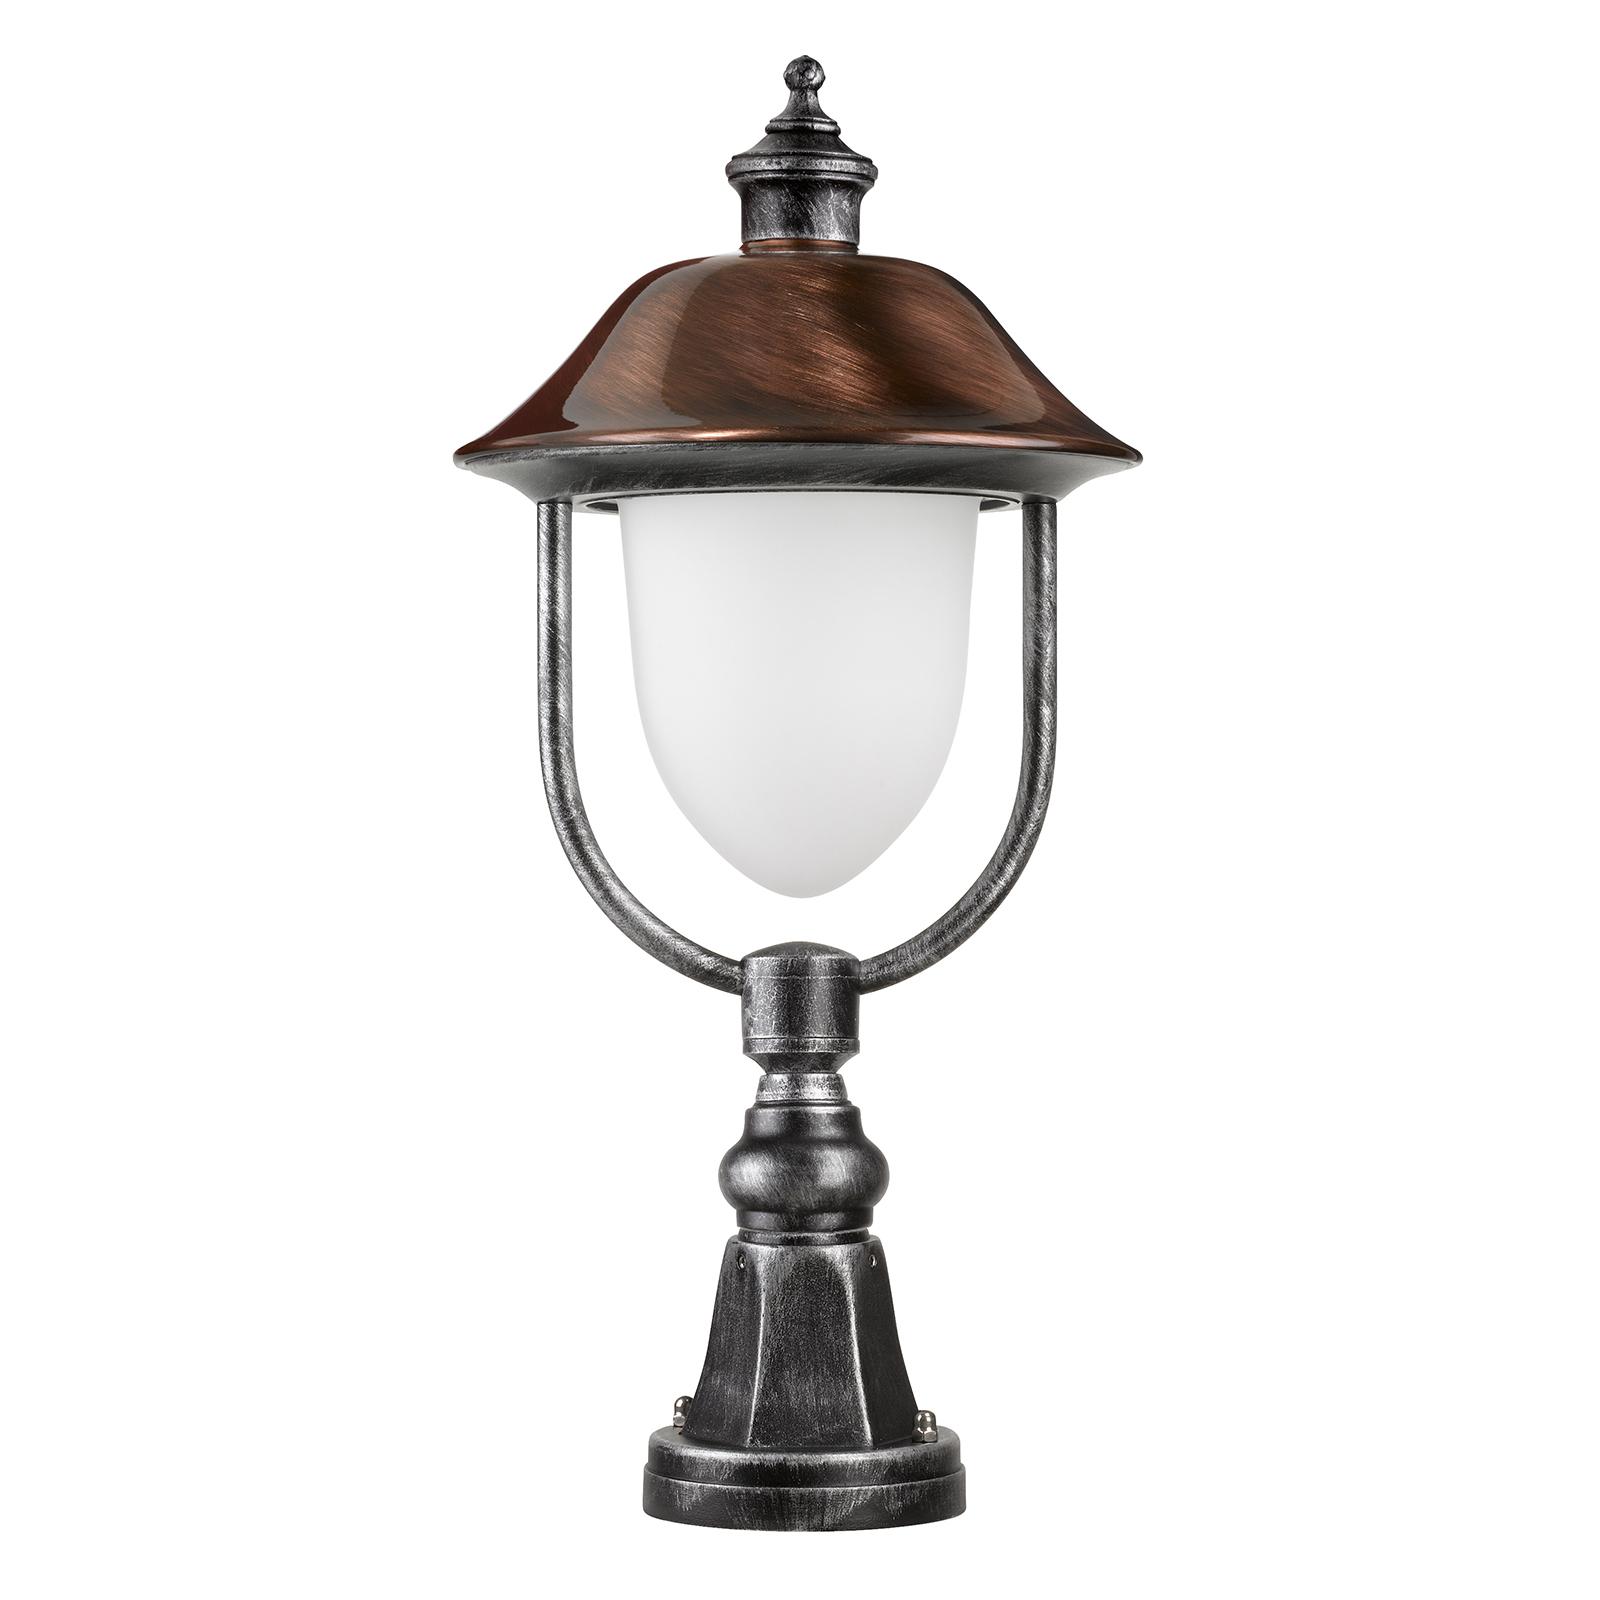 Pollarilamppu 1157, musta/kupari